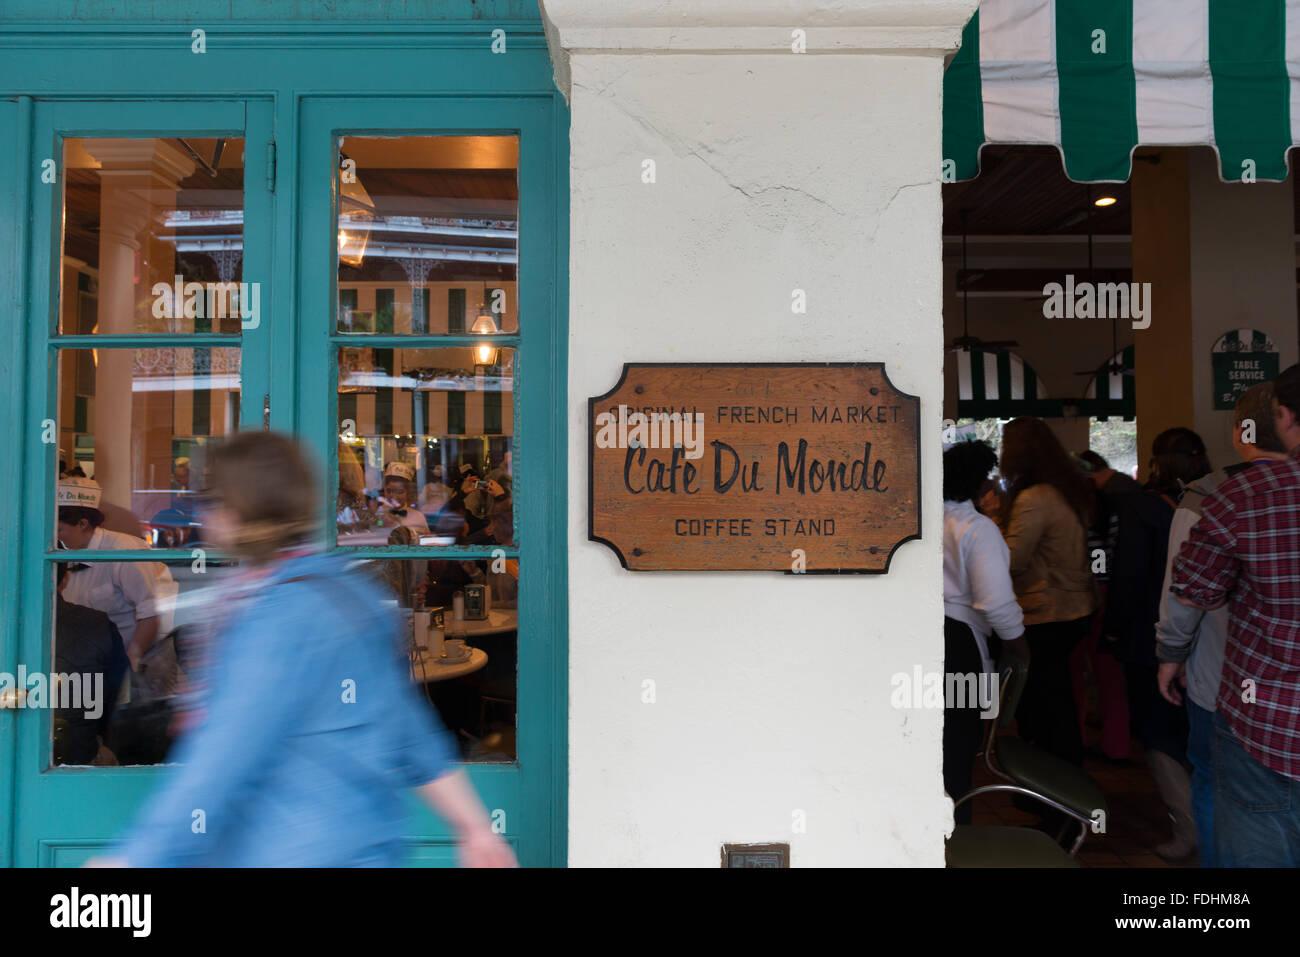 Cafe du Monde in French Quarter, New Orleans - Stock Image